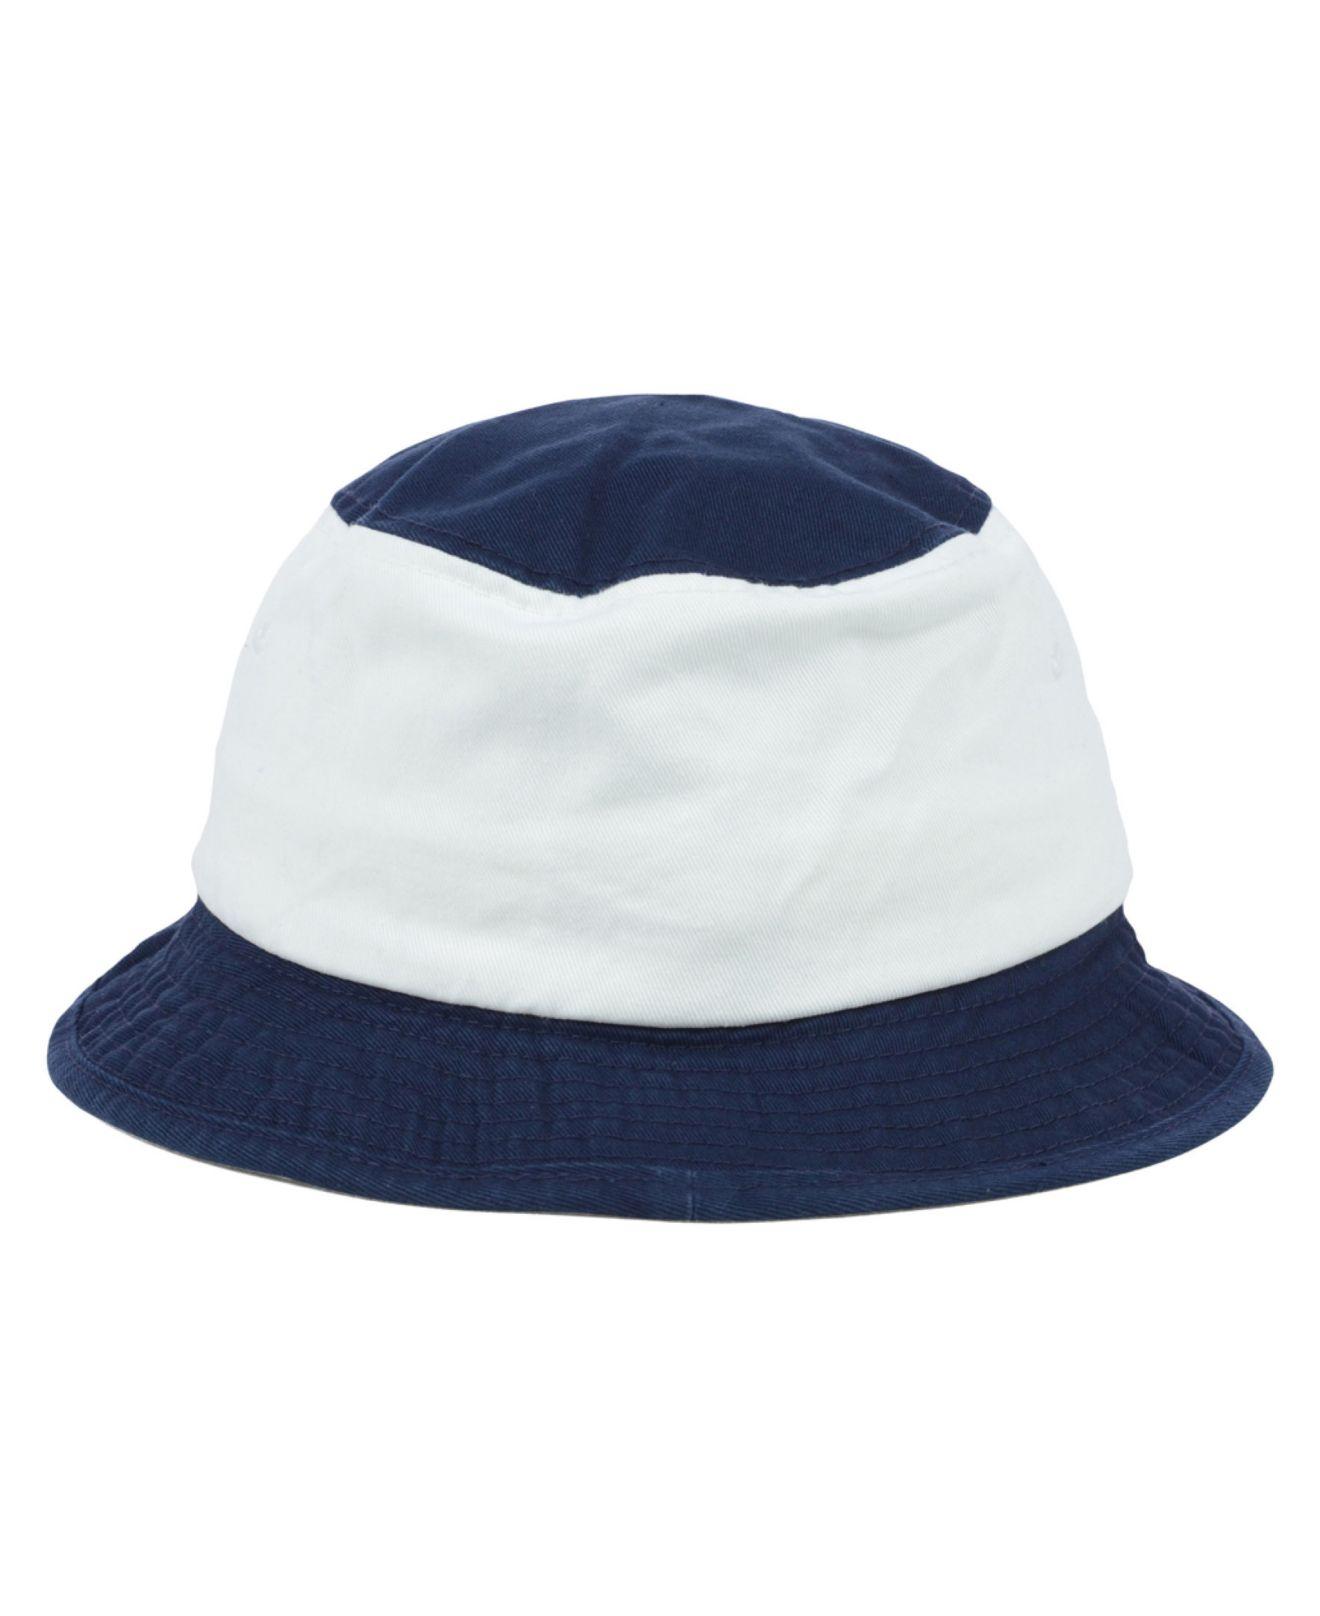 online store d460e 86a6f adidas Notre Dame Fighting Irish Script Bucket Hat in Blue for Men - Lyst